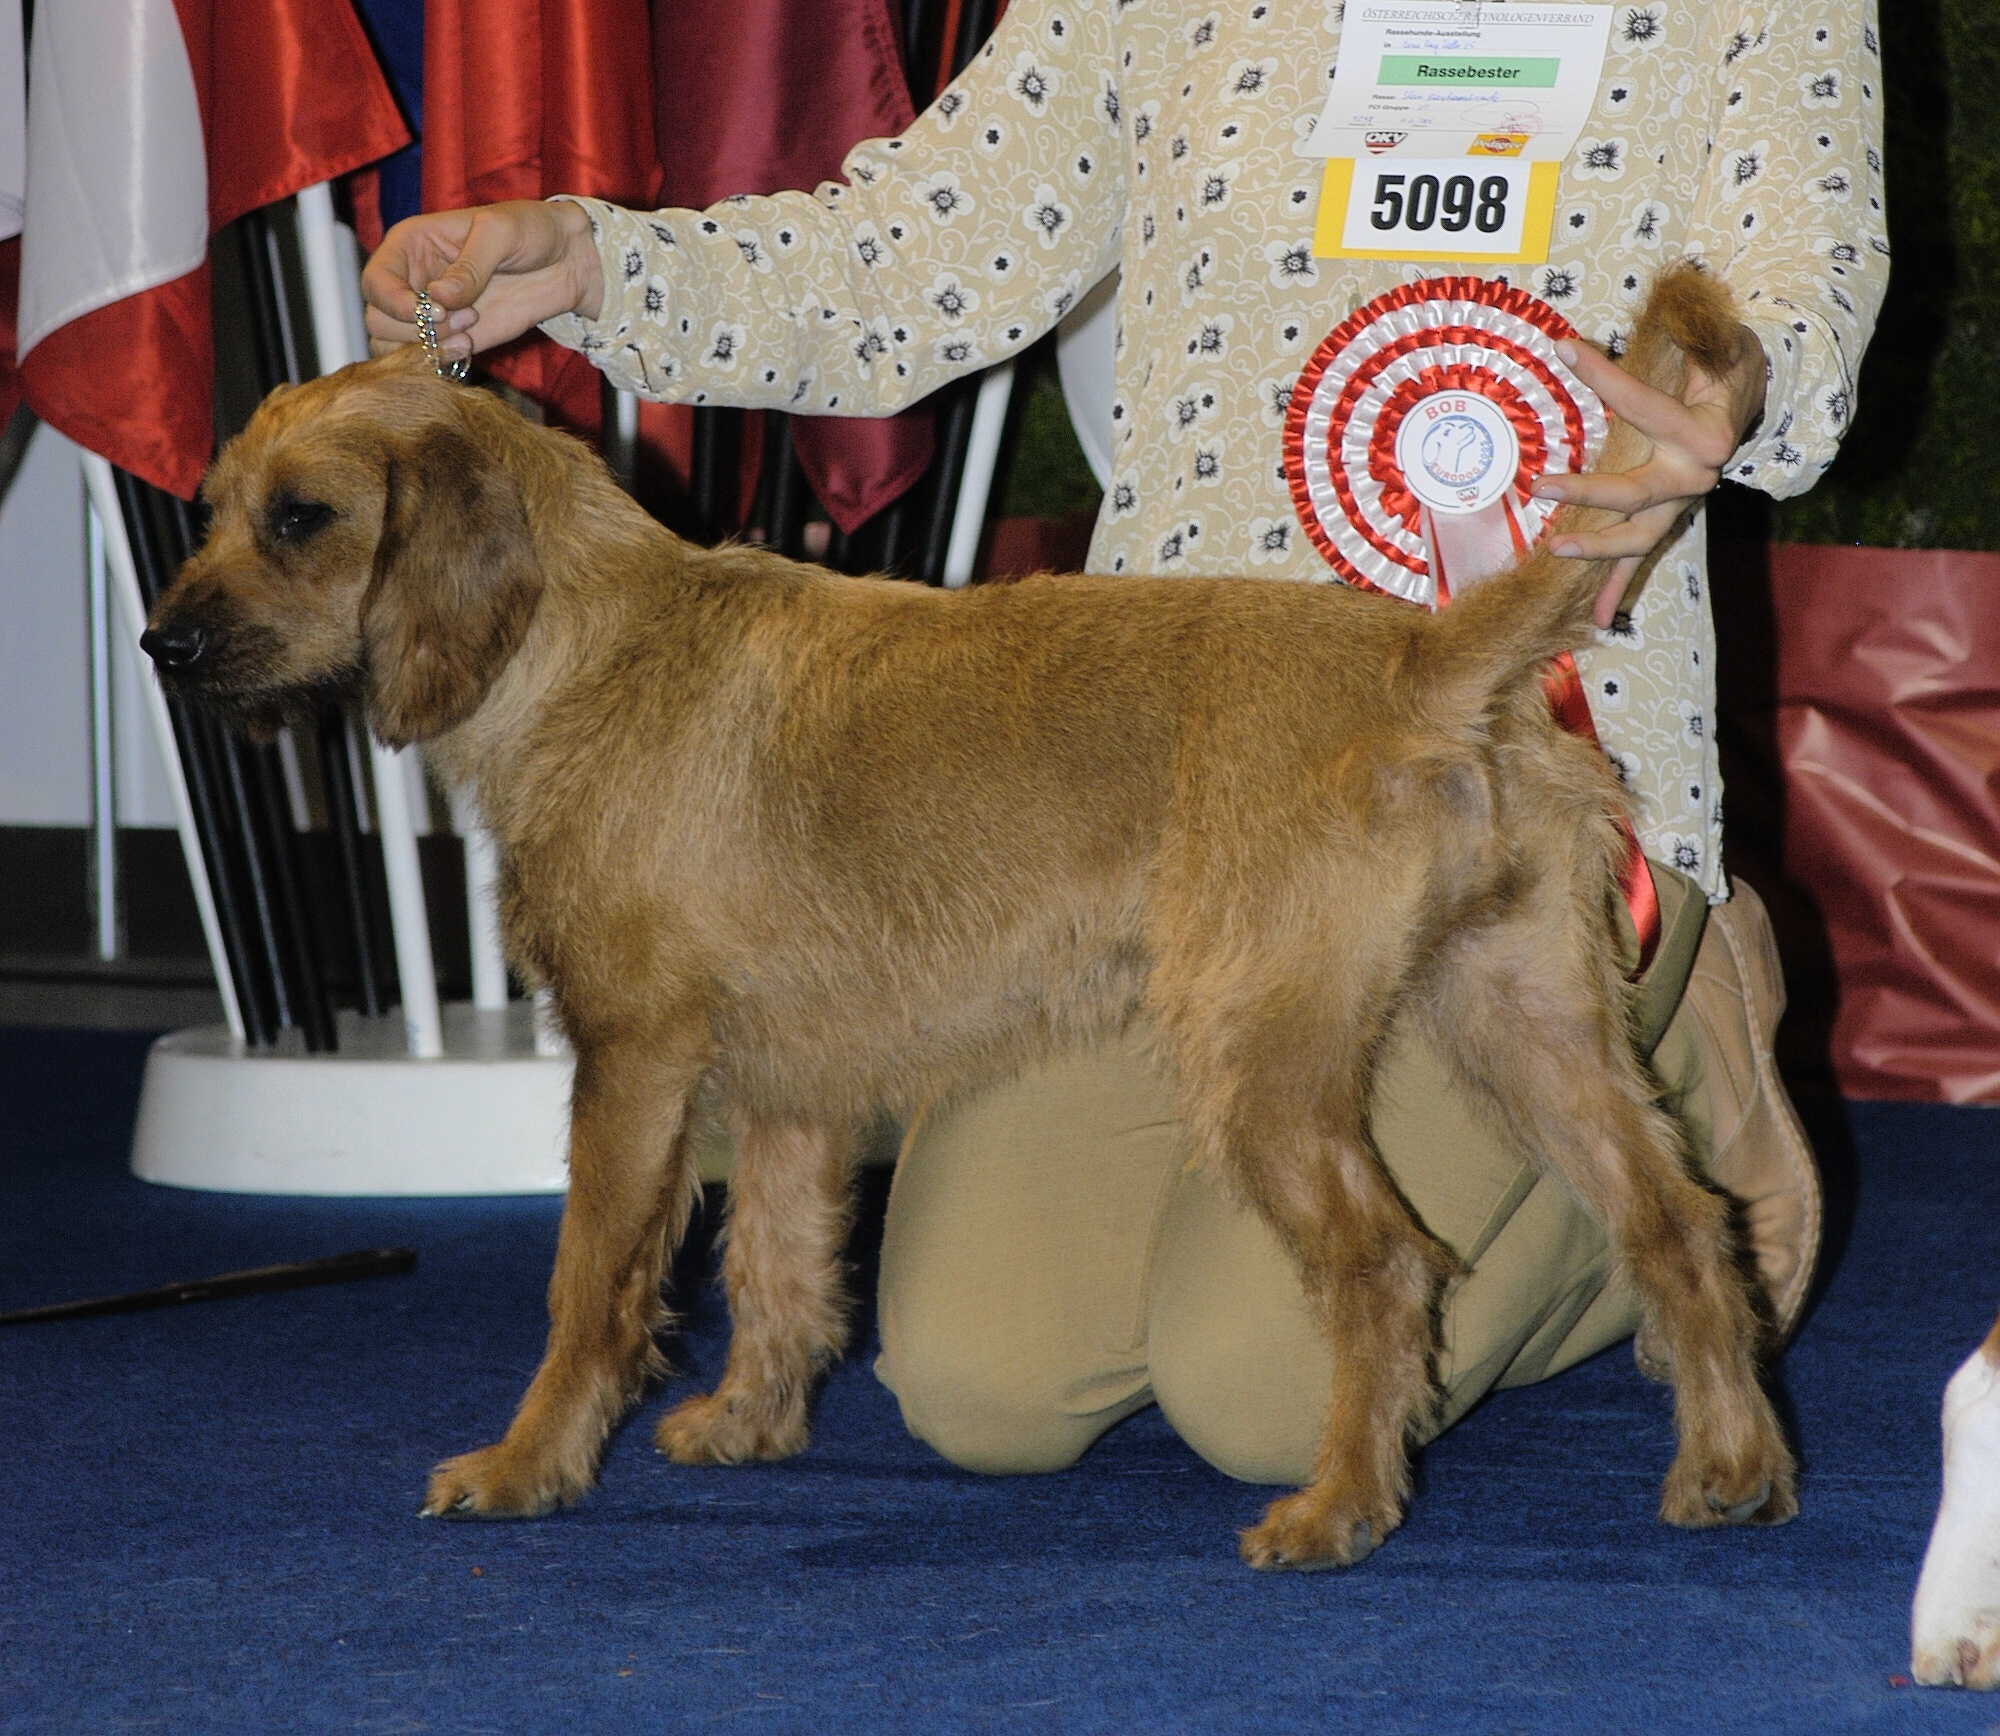 Styrian Coarse-haired Hound Dog: Styrian Coarse Haired Styrian Hound Breed